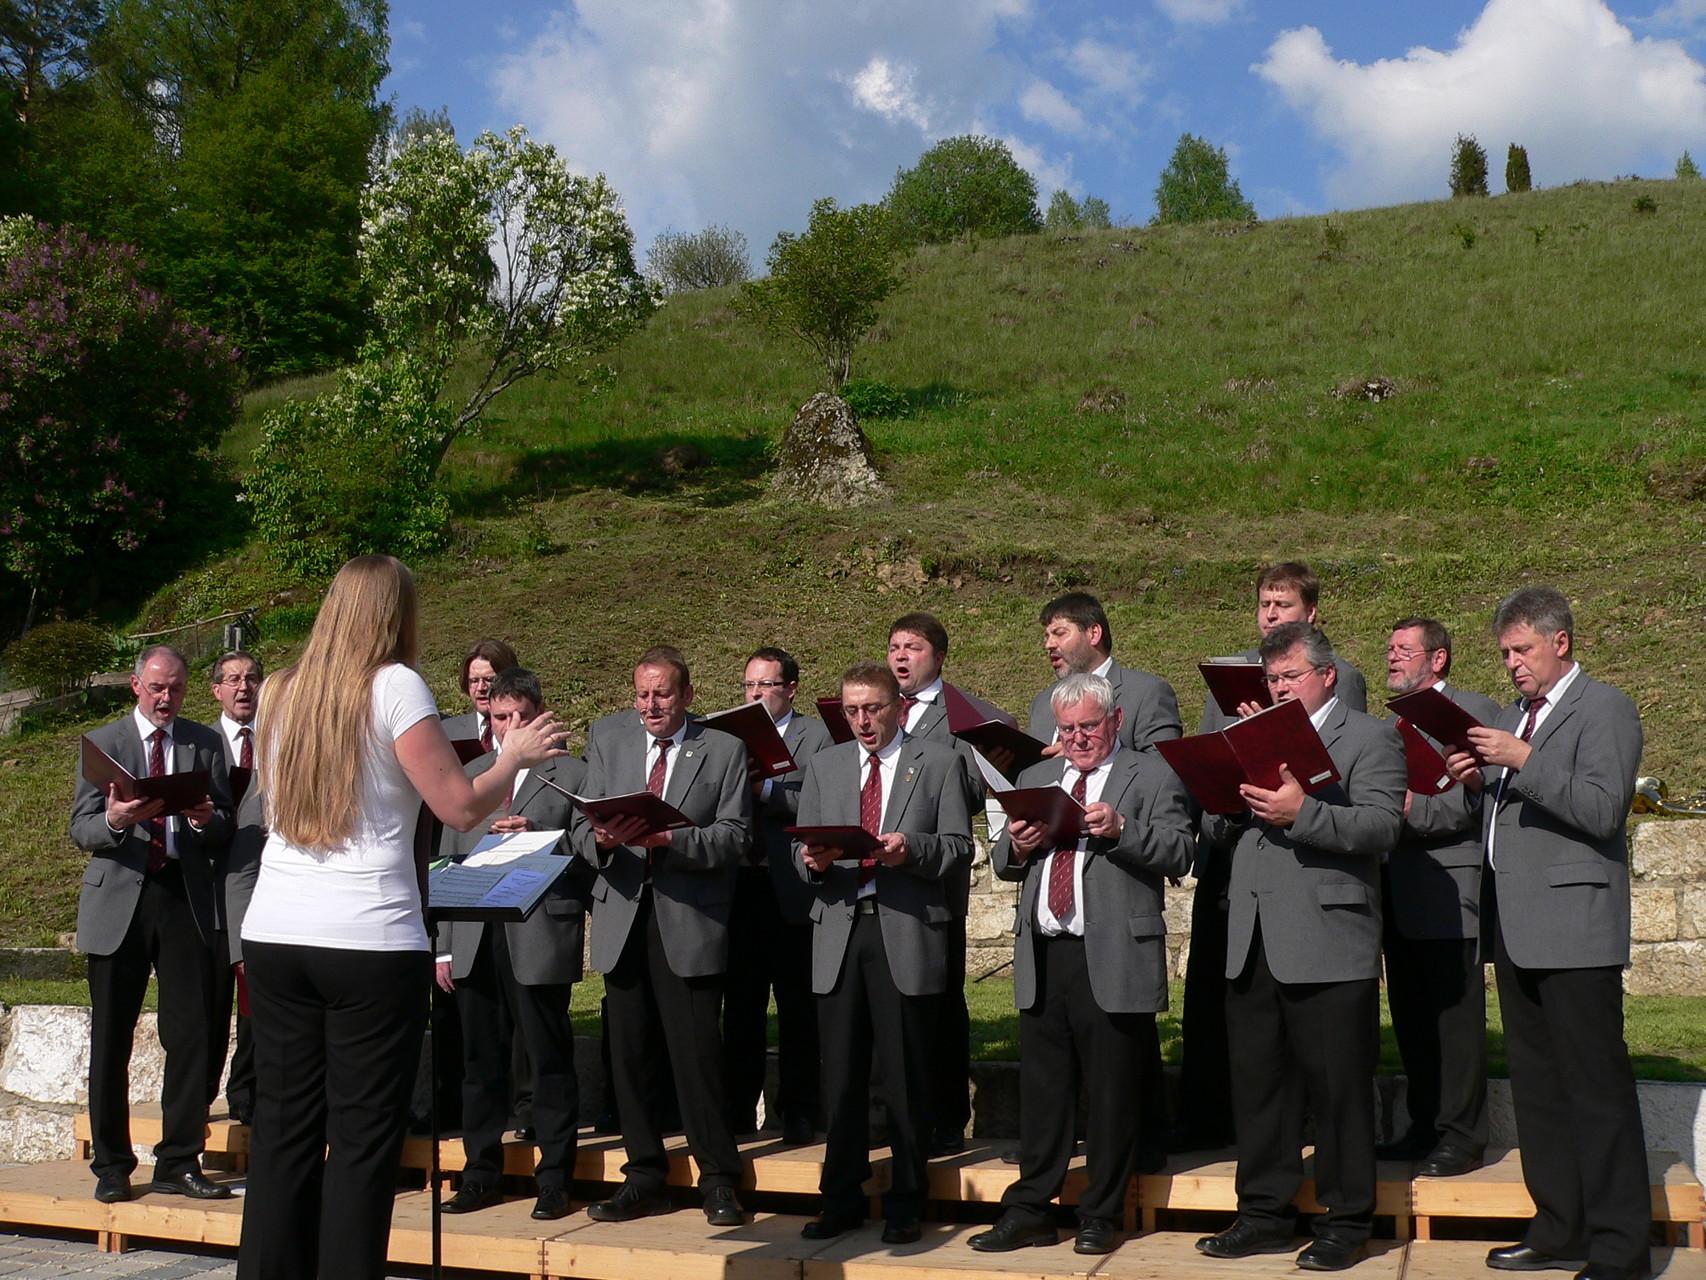 Männerchor Gesangverein Alfeld